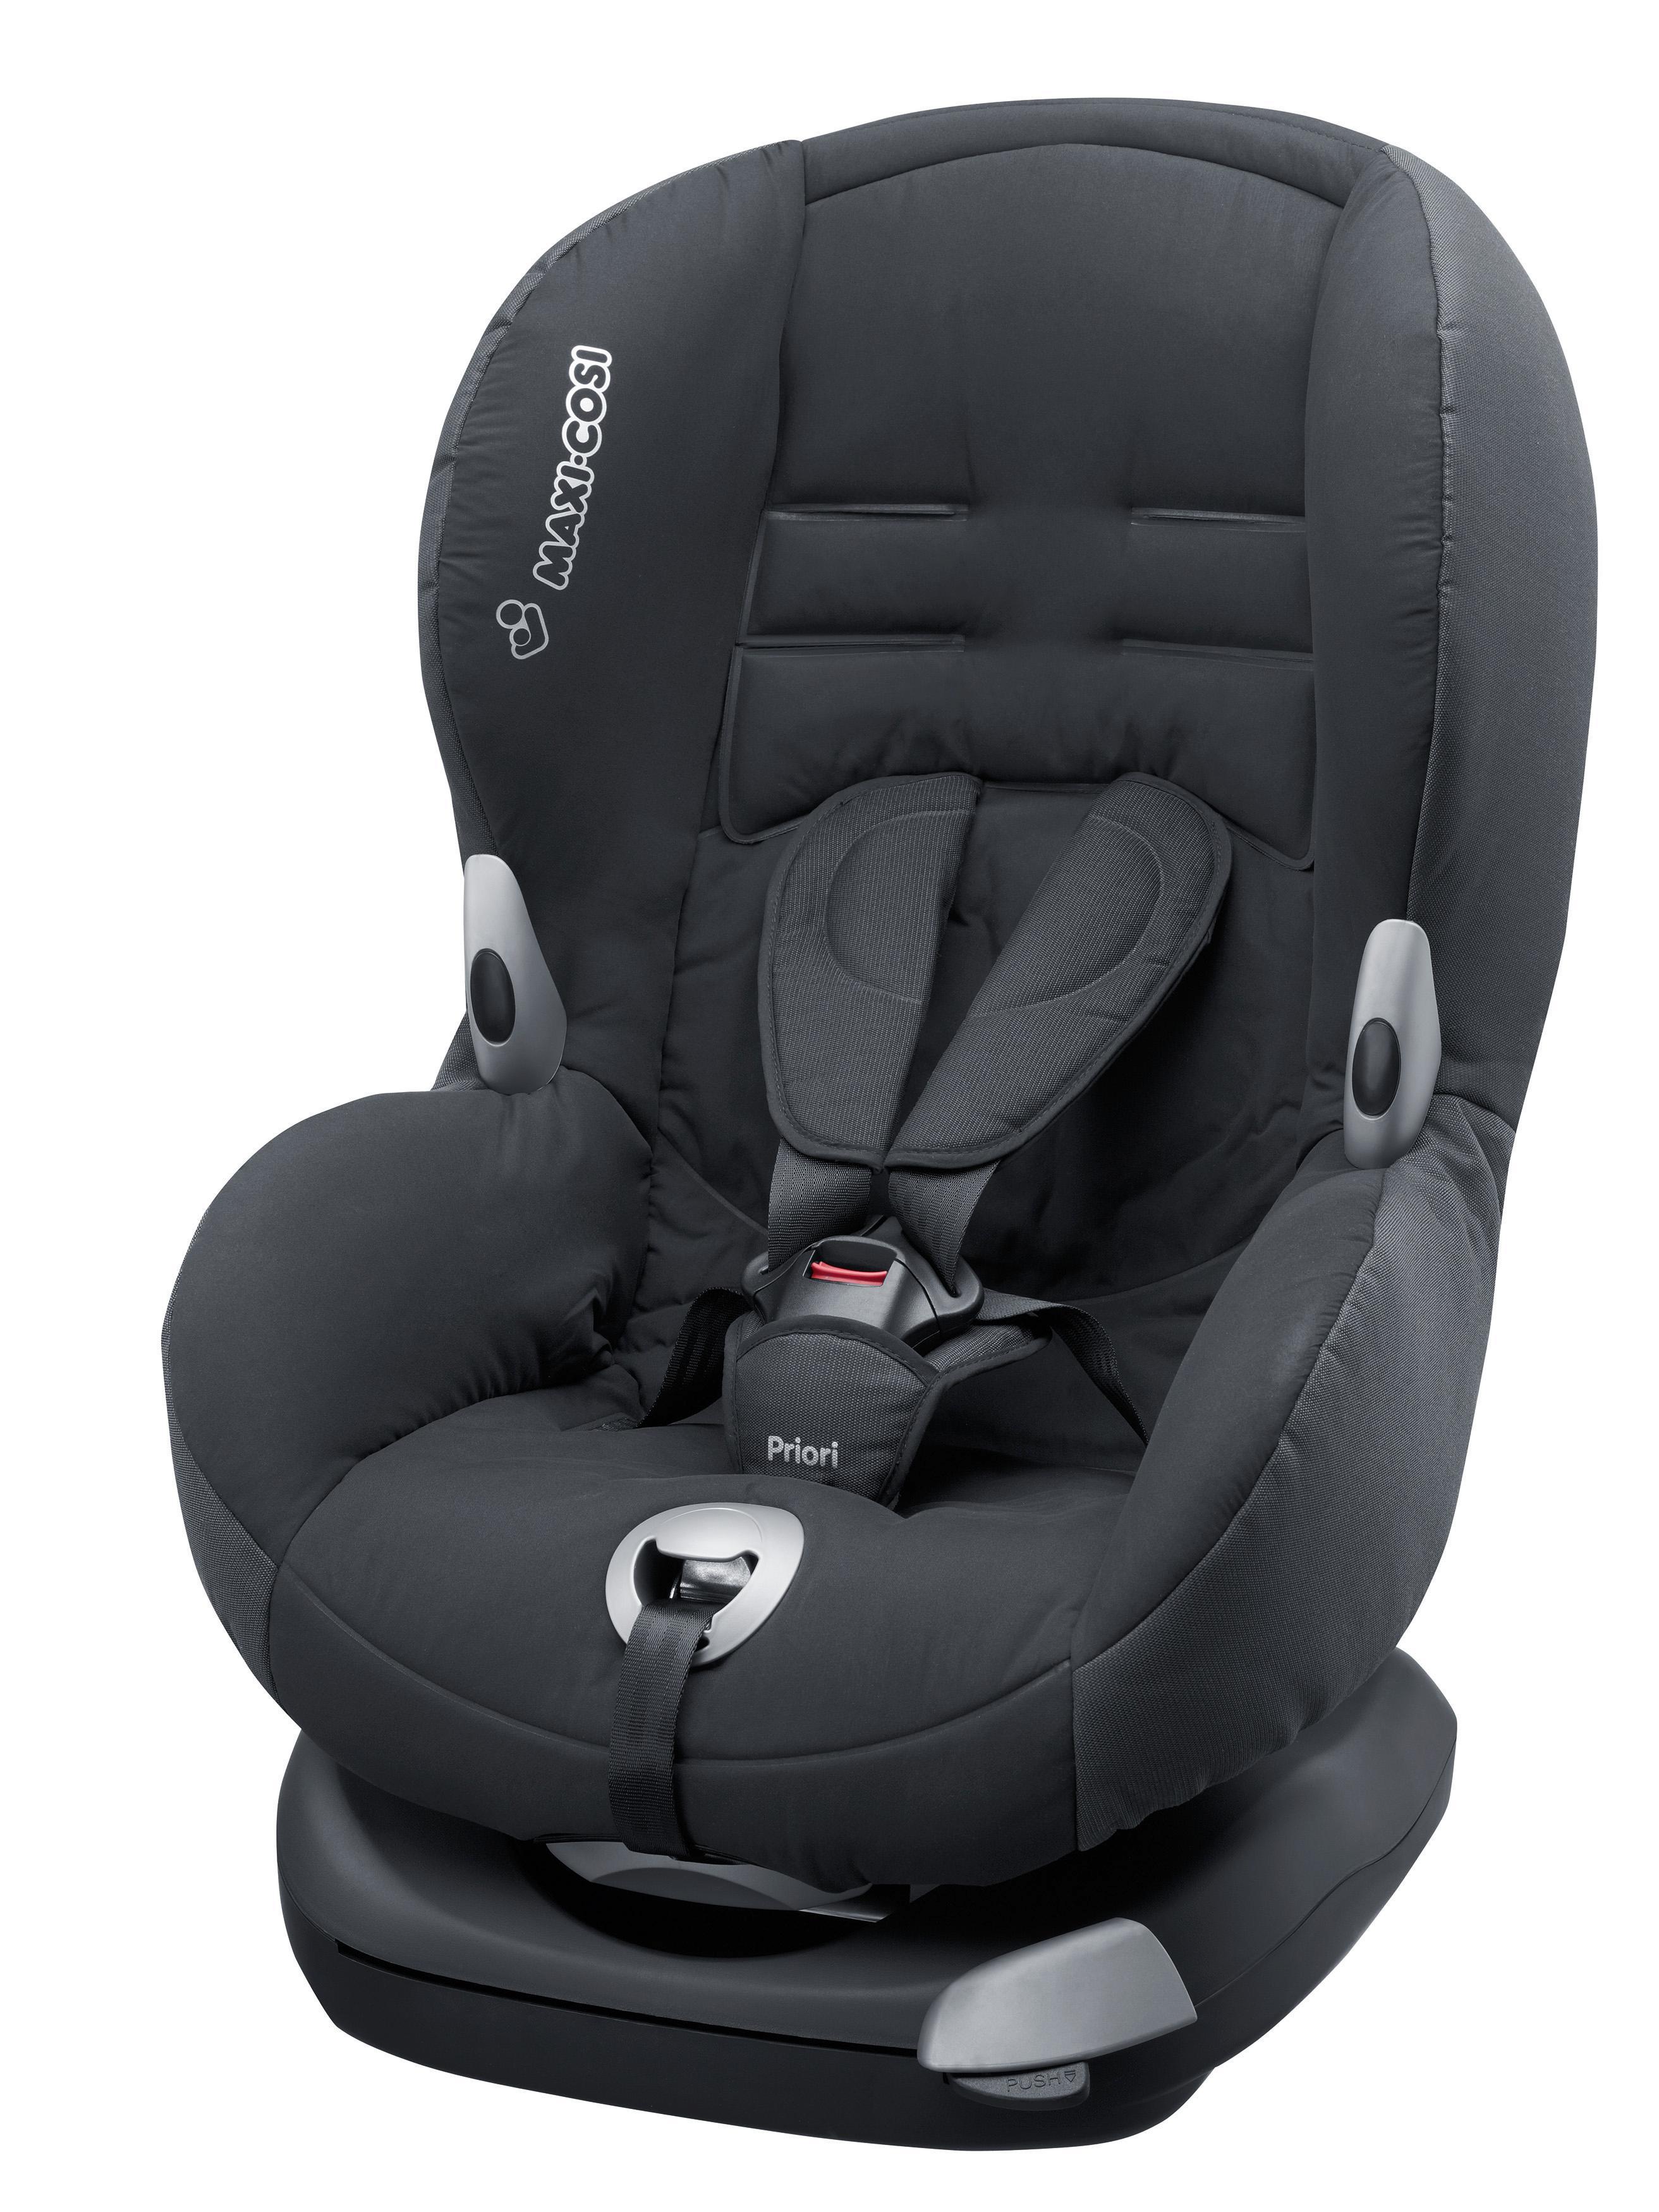 maxi cosi priori xp group 1 car seat phantom 2015 range. Black Bedroom Furniture Sets. Home Design Ideas